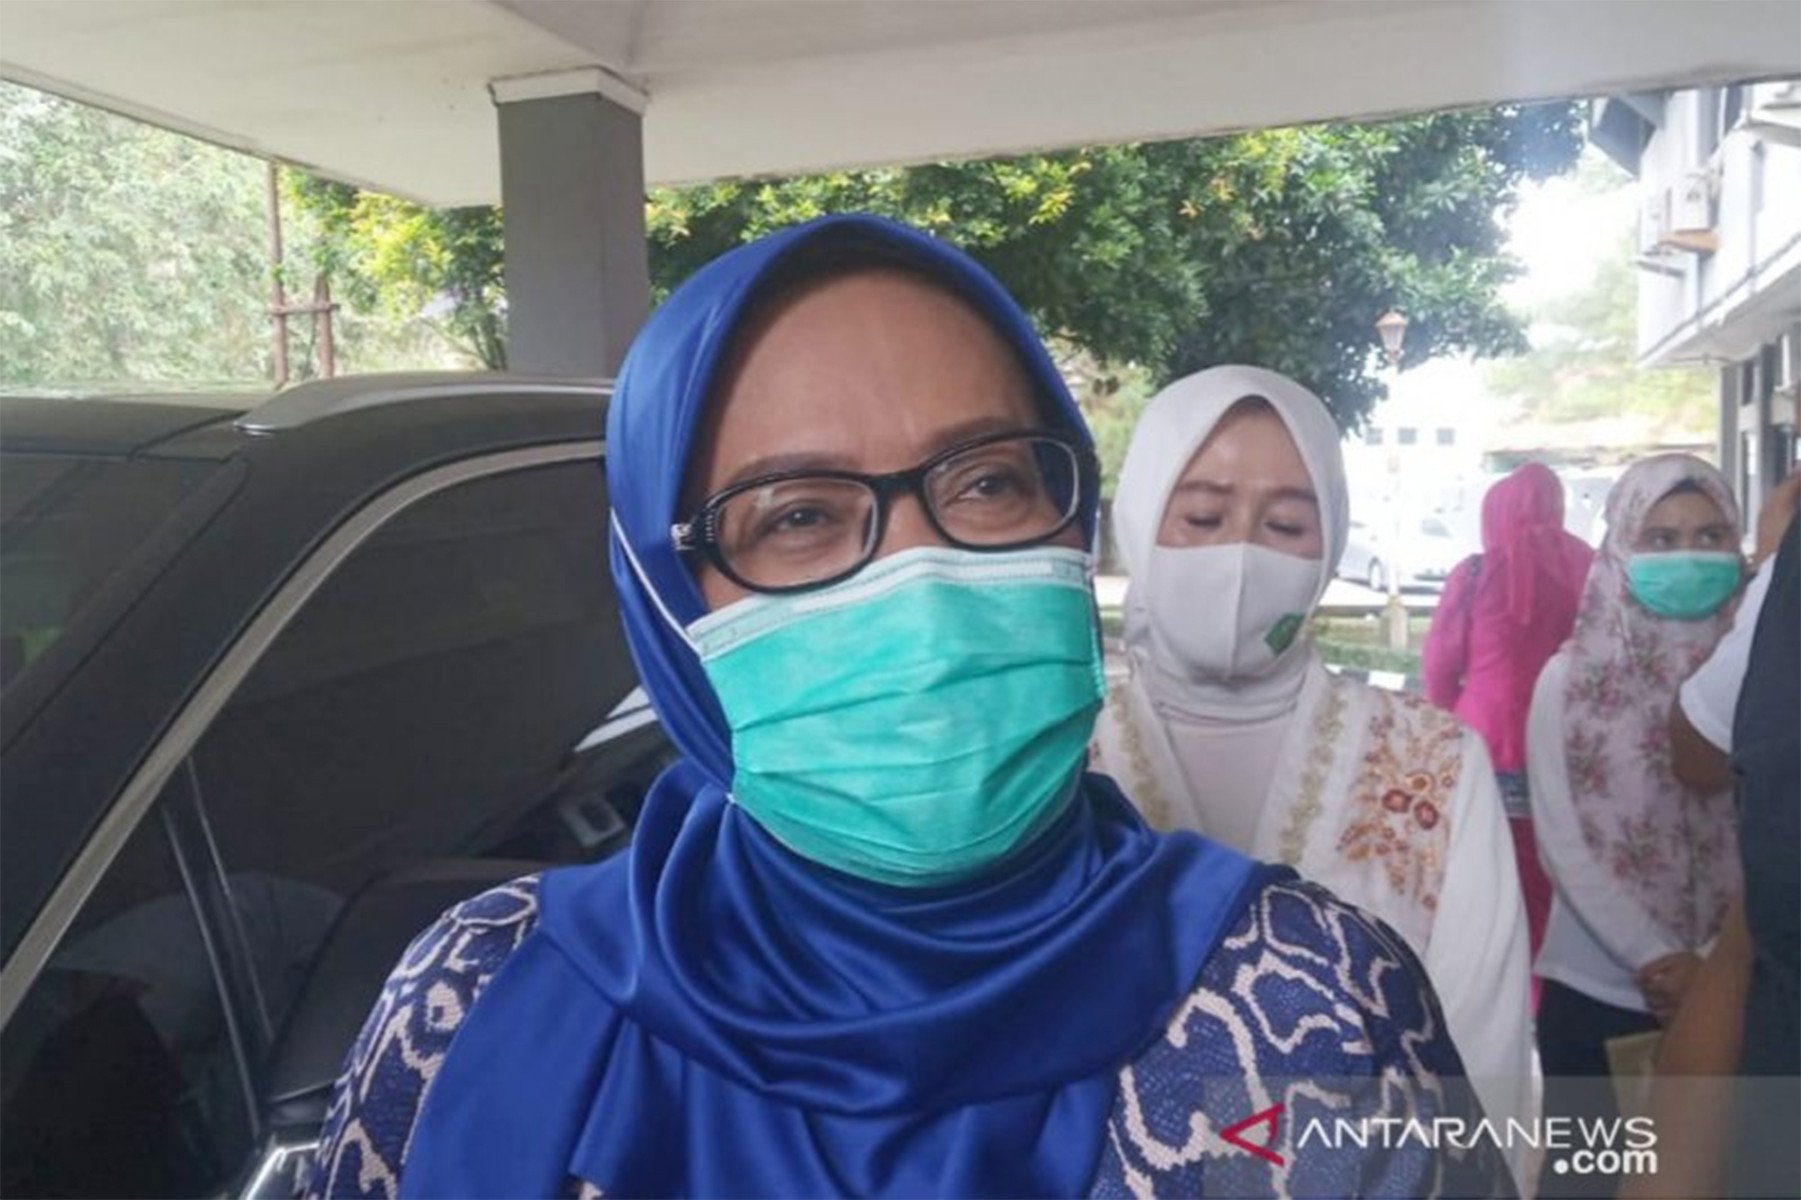 Kabar Tak Sedap soal Zona Penularan COVID-19 di Kabupaten Bogor - JPNN.com